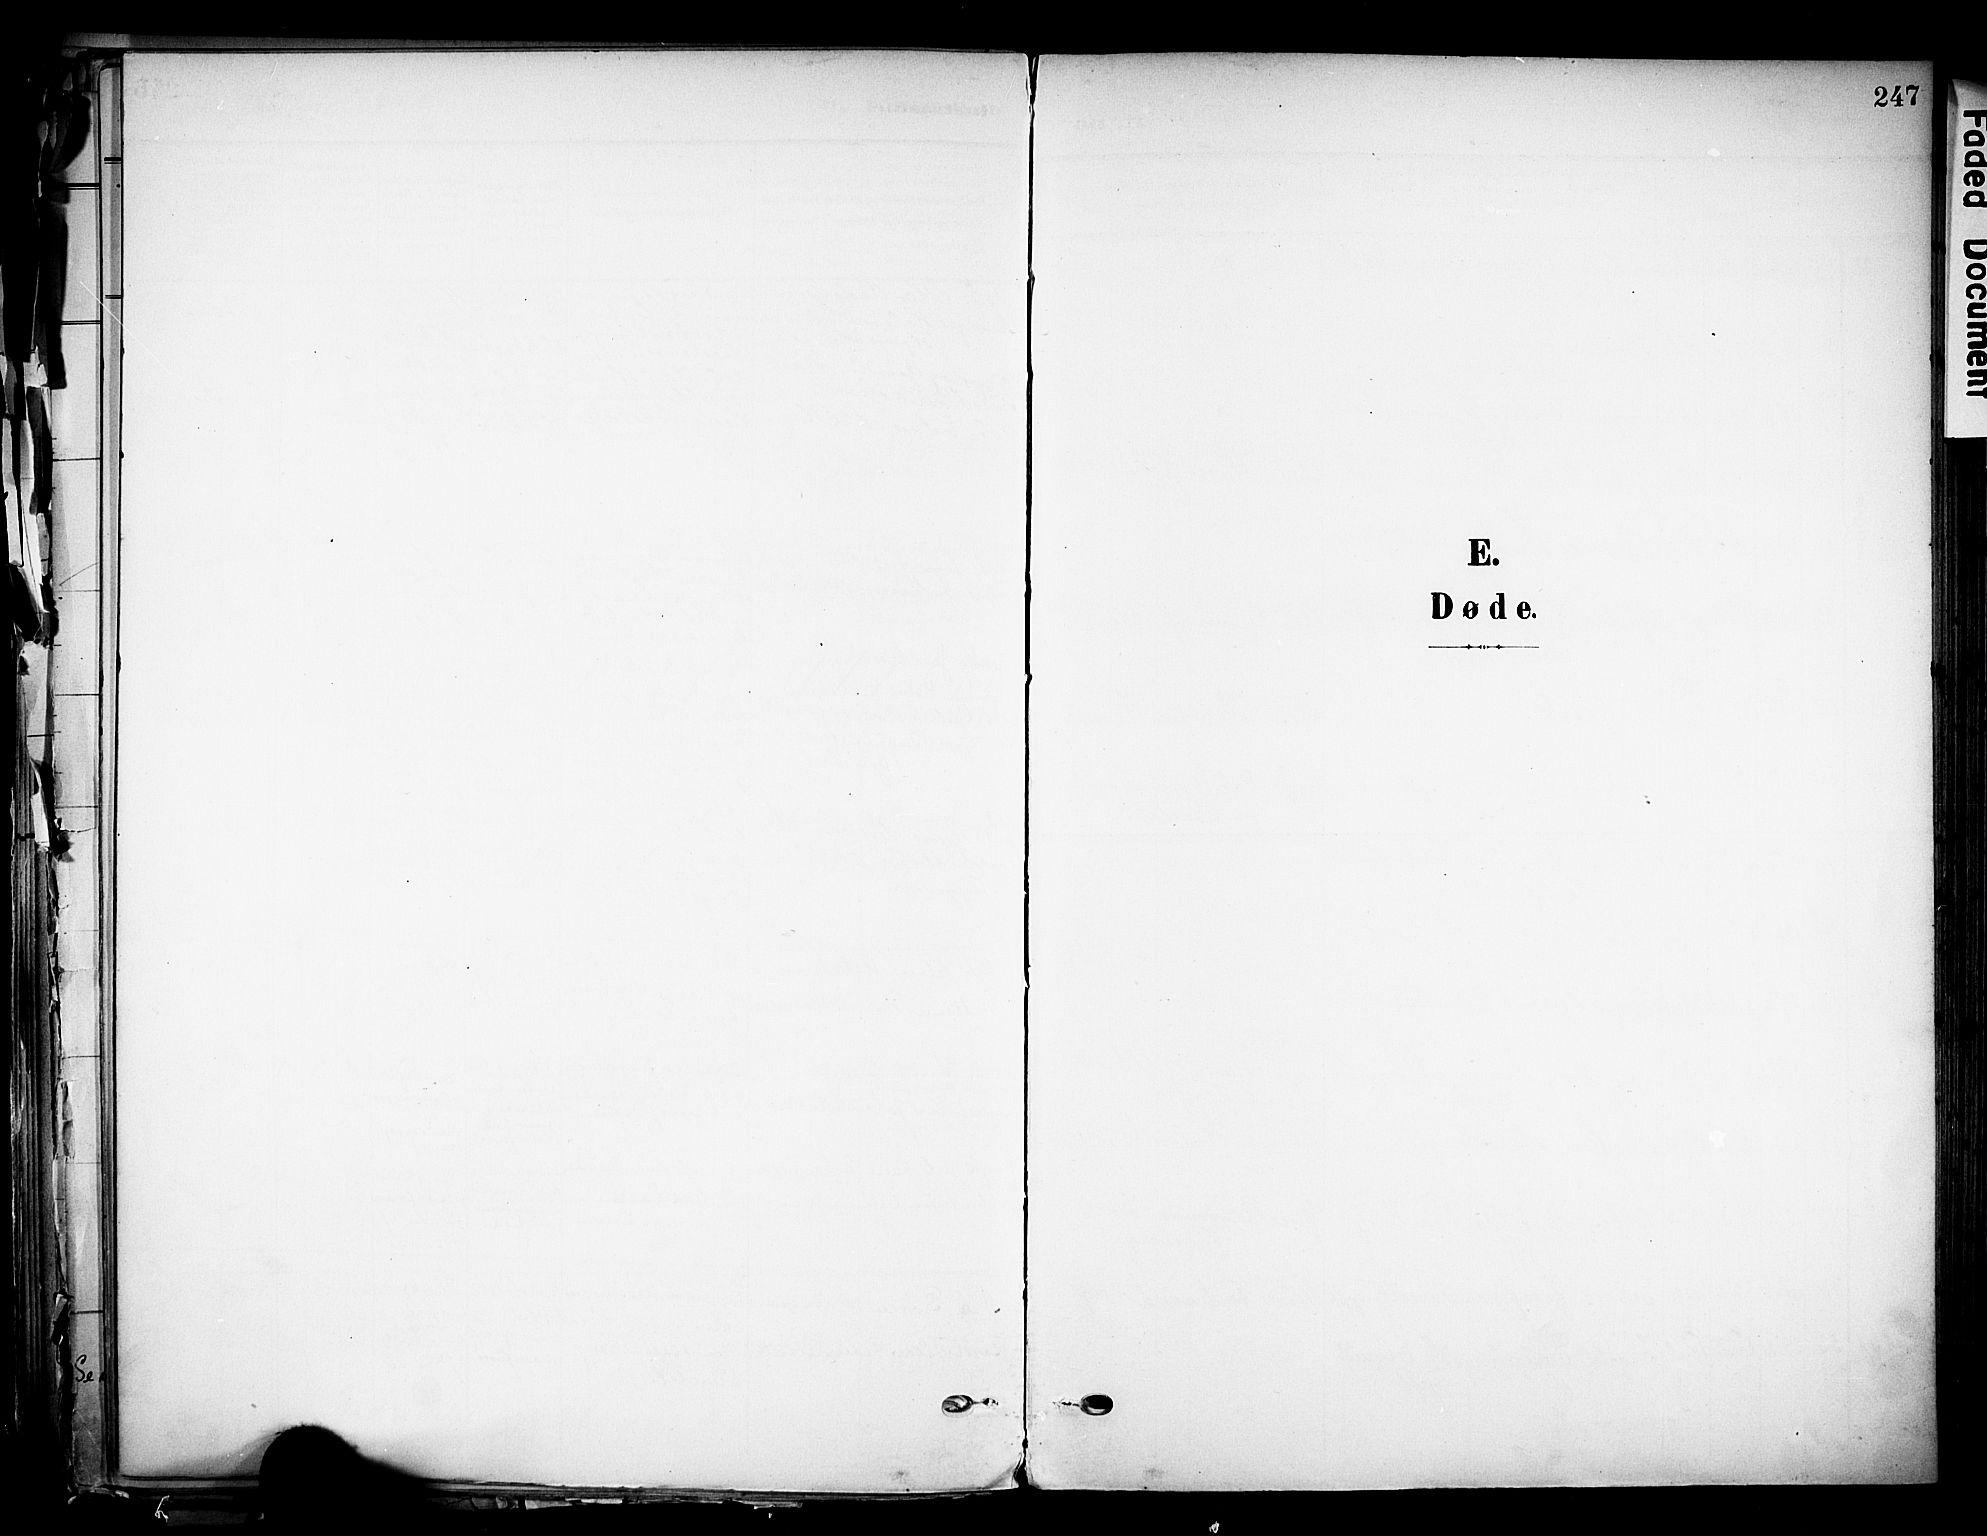 SAKO, Solum kirkebøker, F/Fa/L0011: Ministerialbok nr. I 11, 1898-1909, s. 247